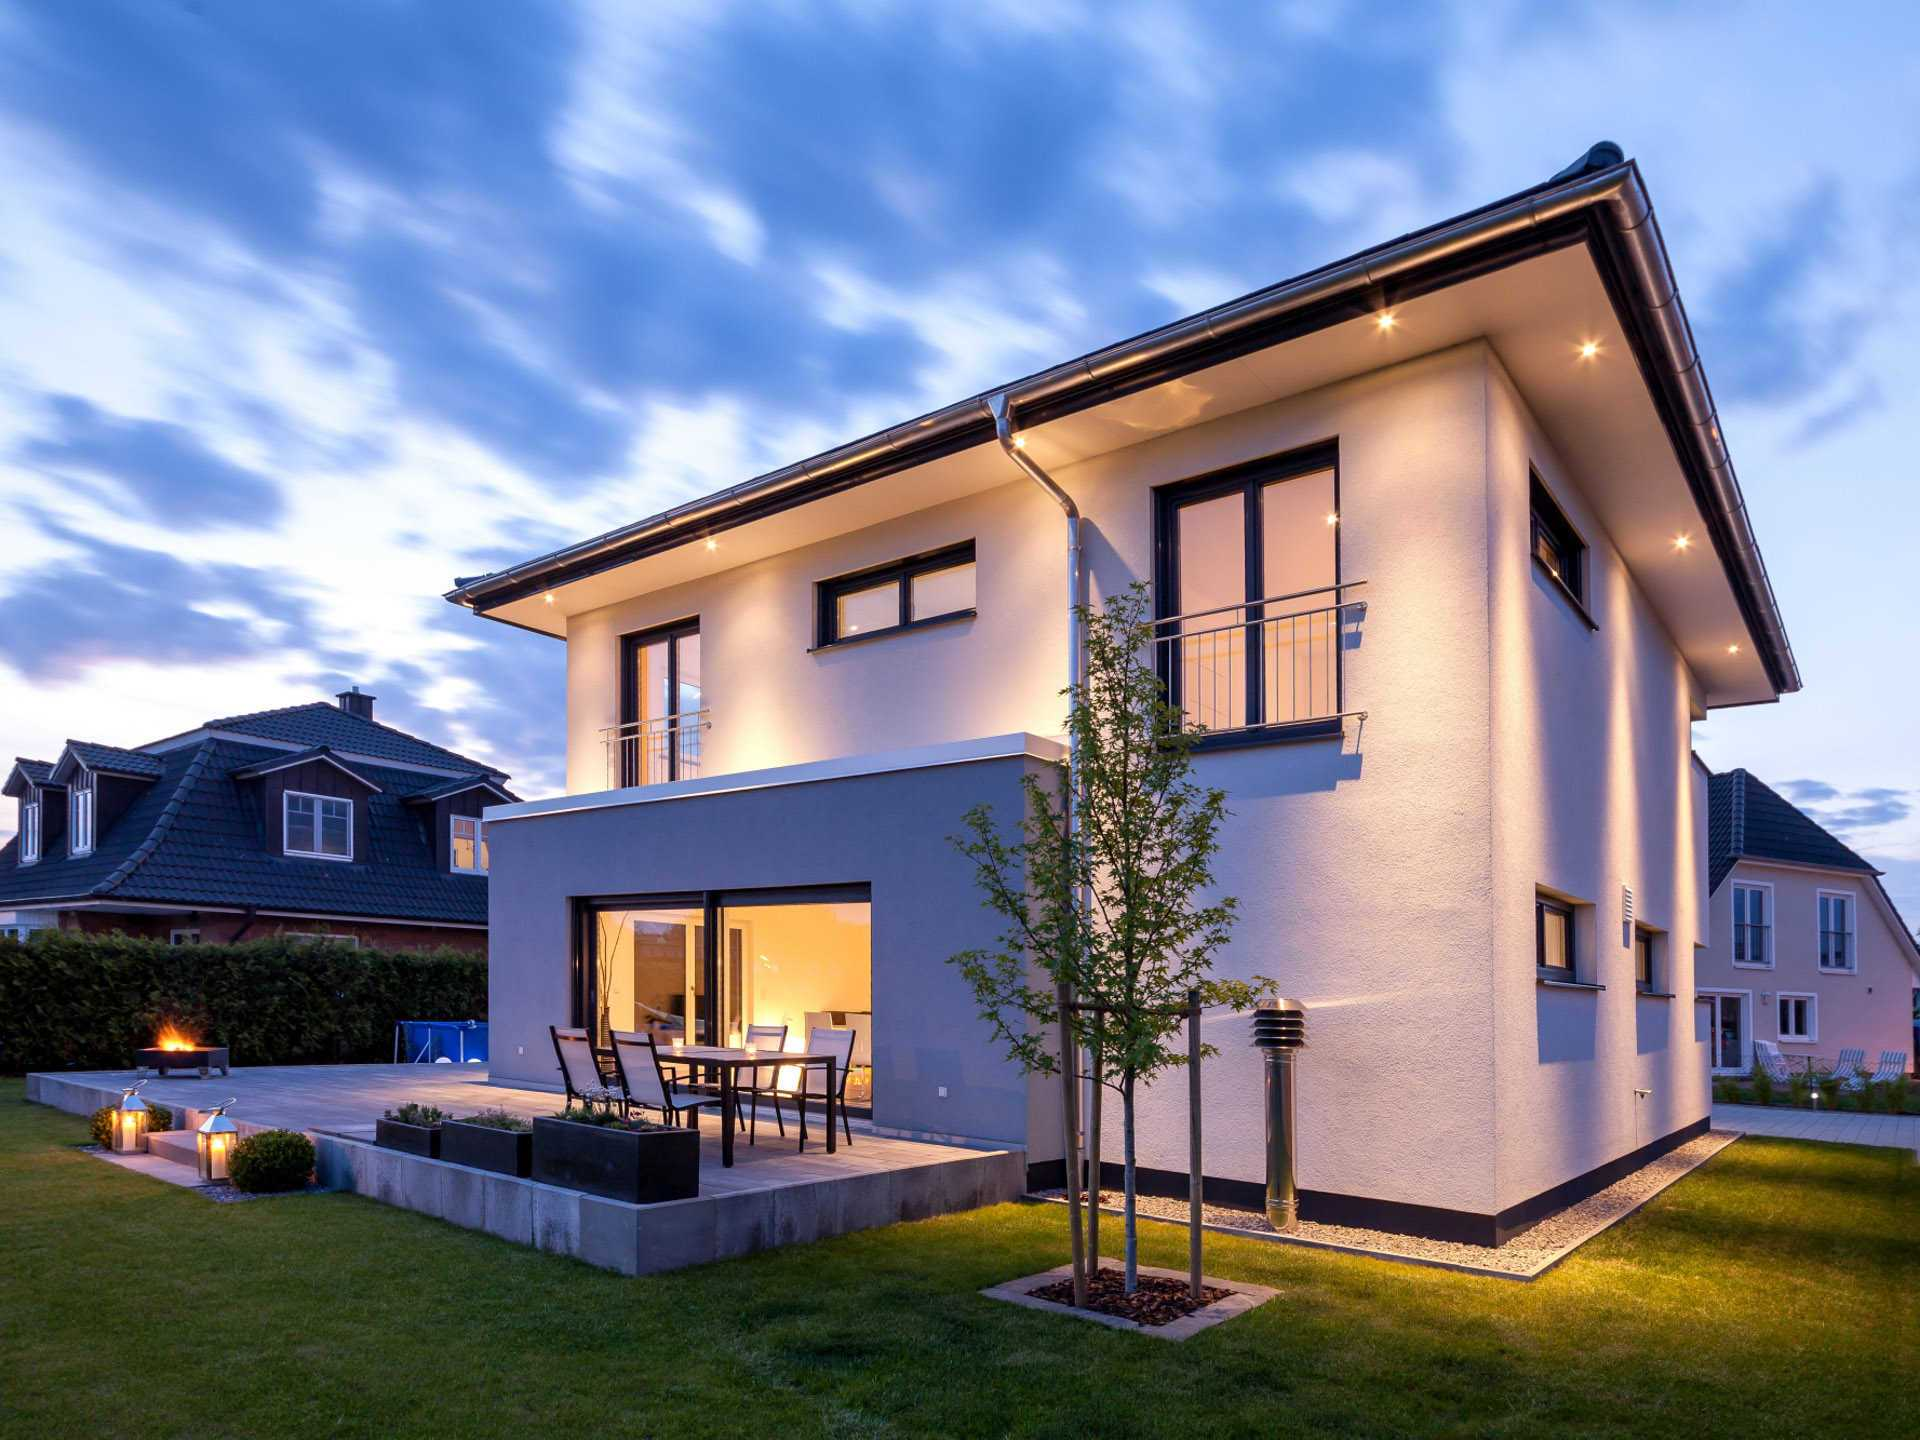 hausbau nach feng shui. Black Bedroom Furniture Sets. Home Design Ideas